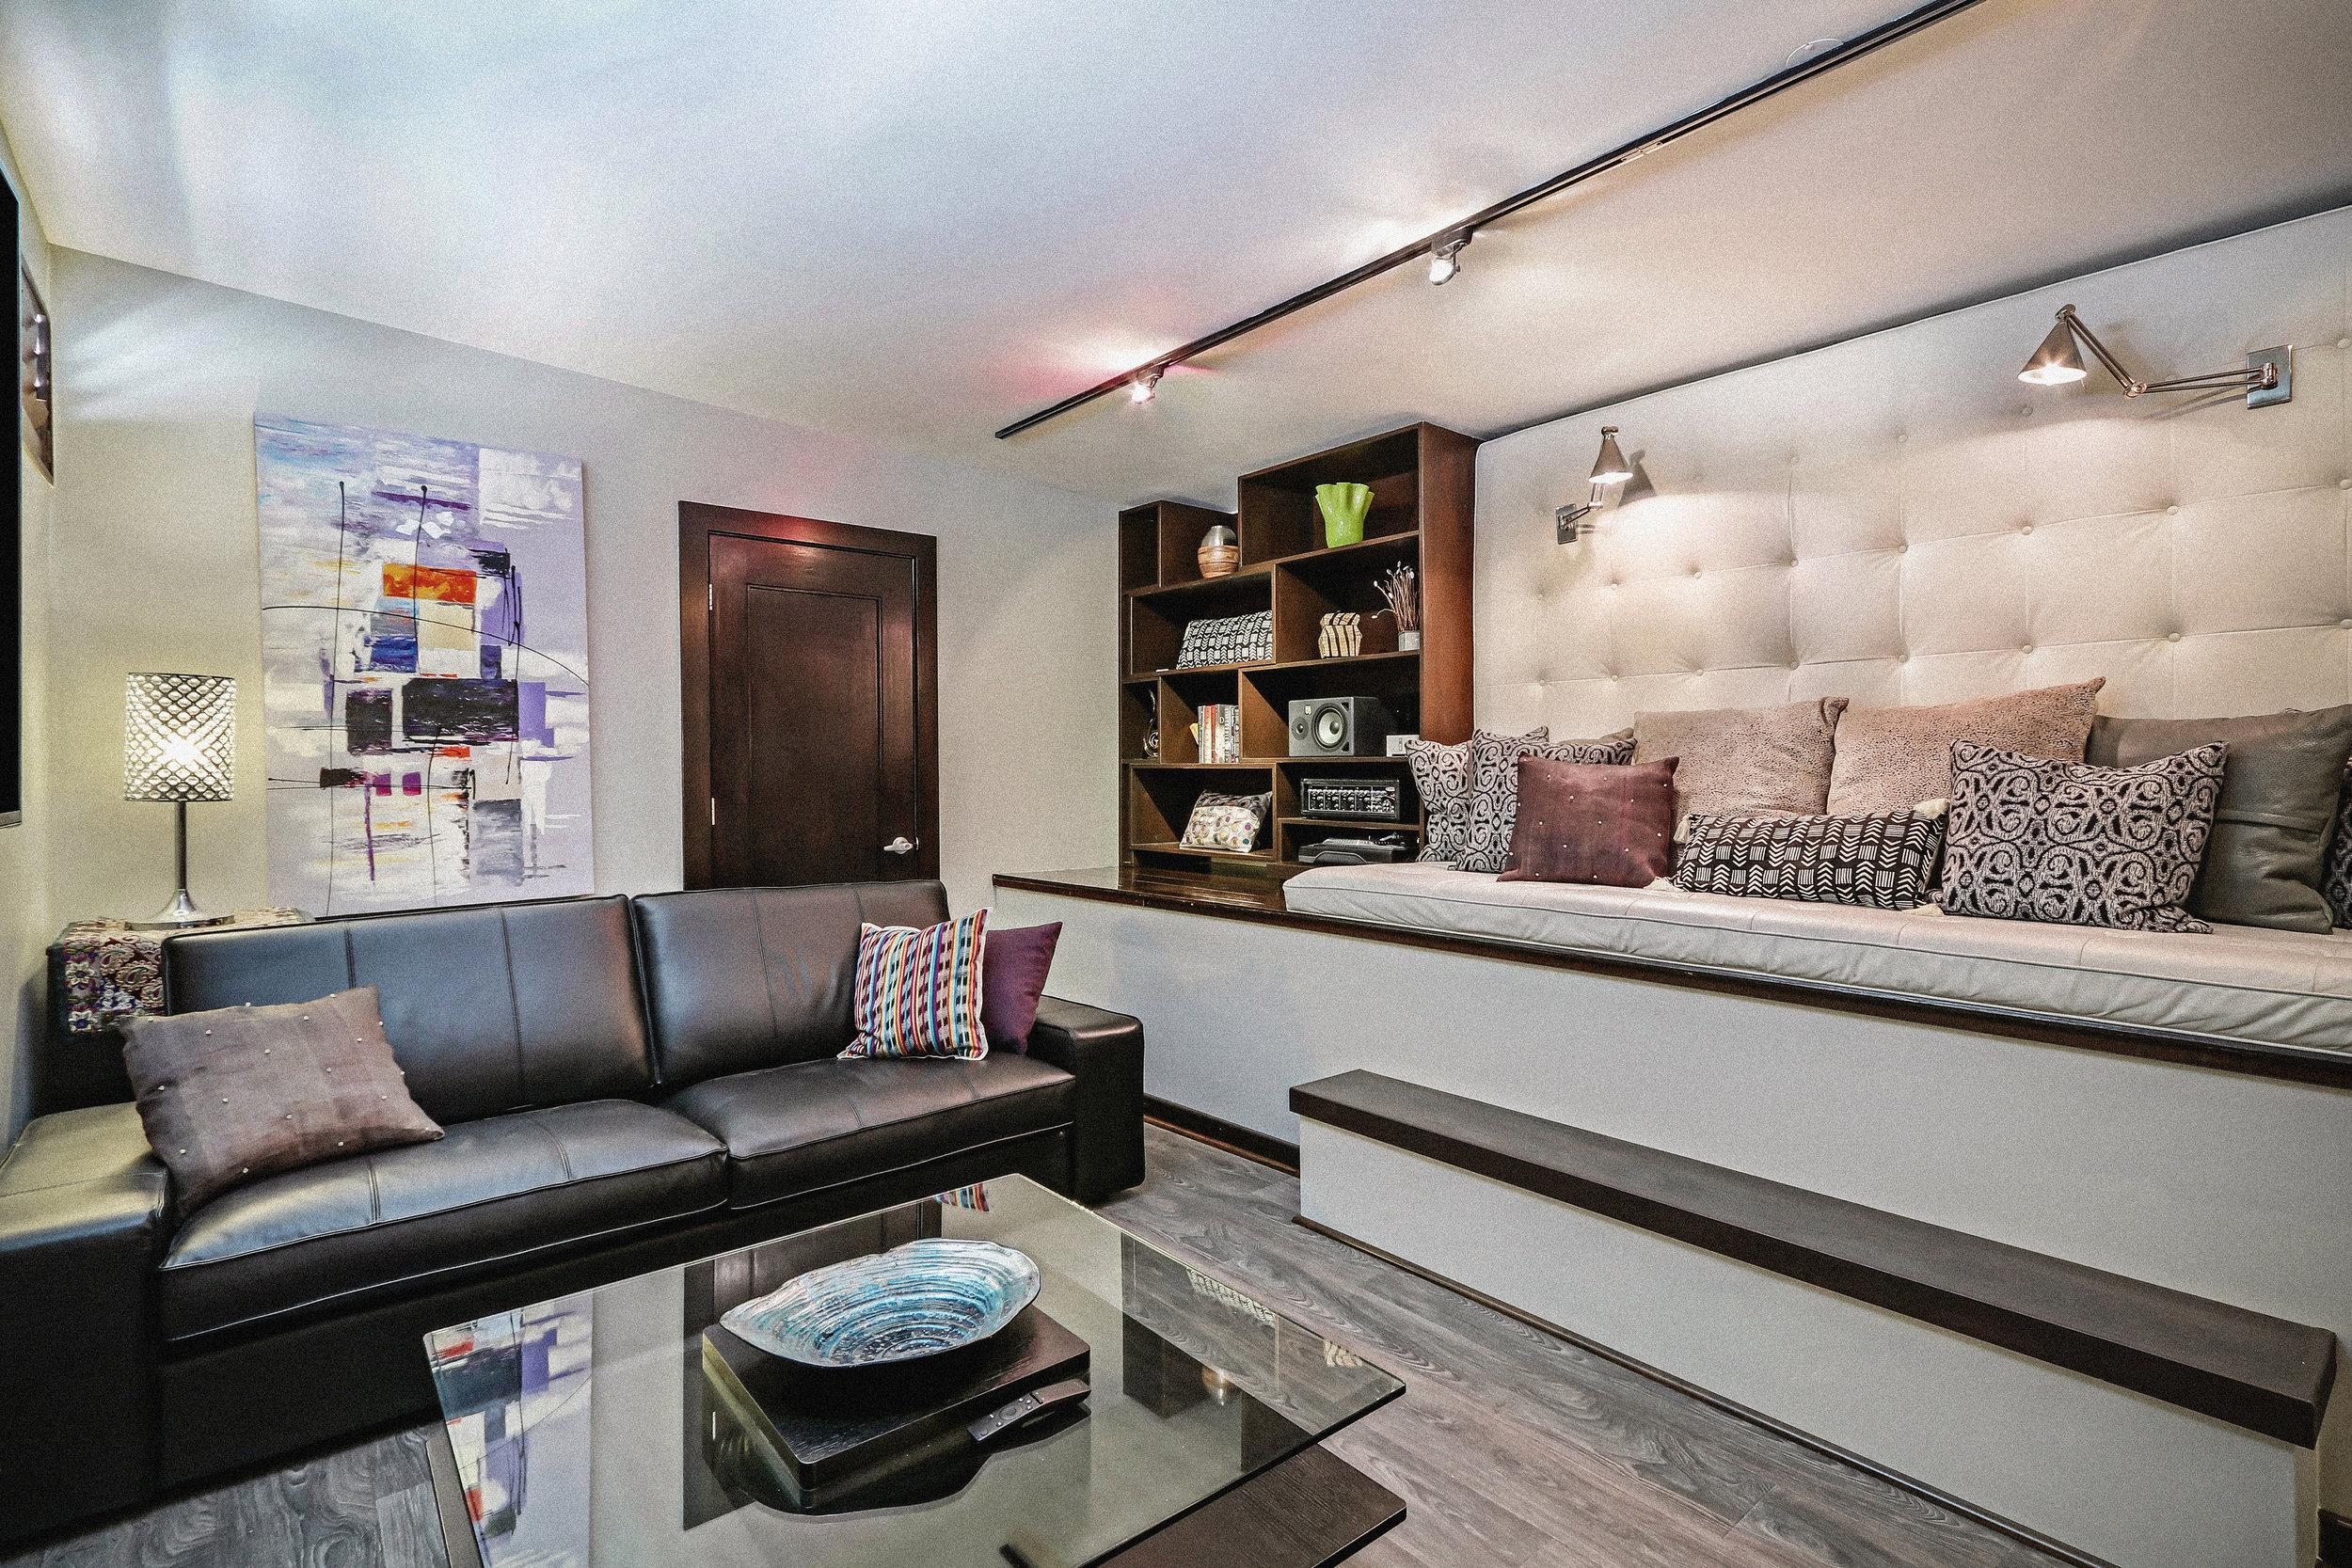 studio-a-lounge.jpg